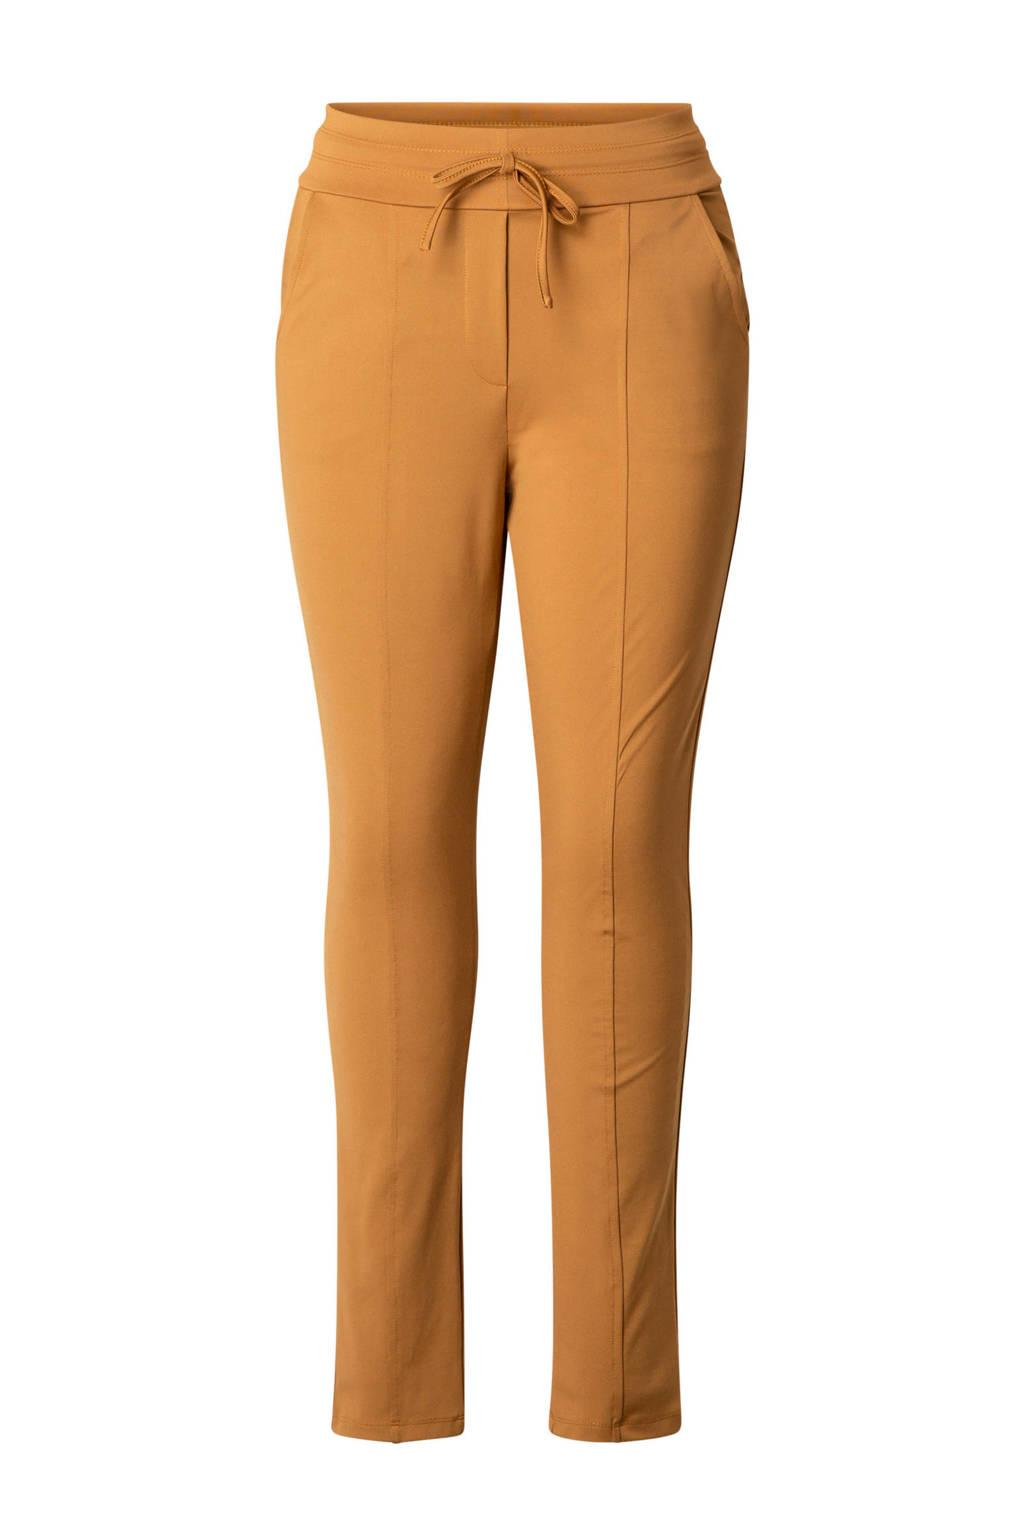 ES&SY high waist skinny broek Naïma oranje, Oranje